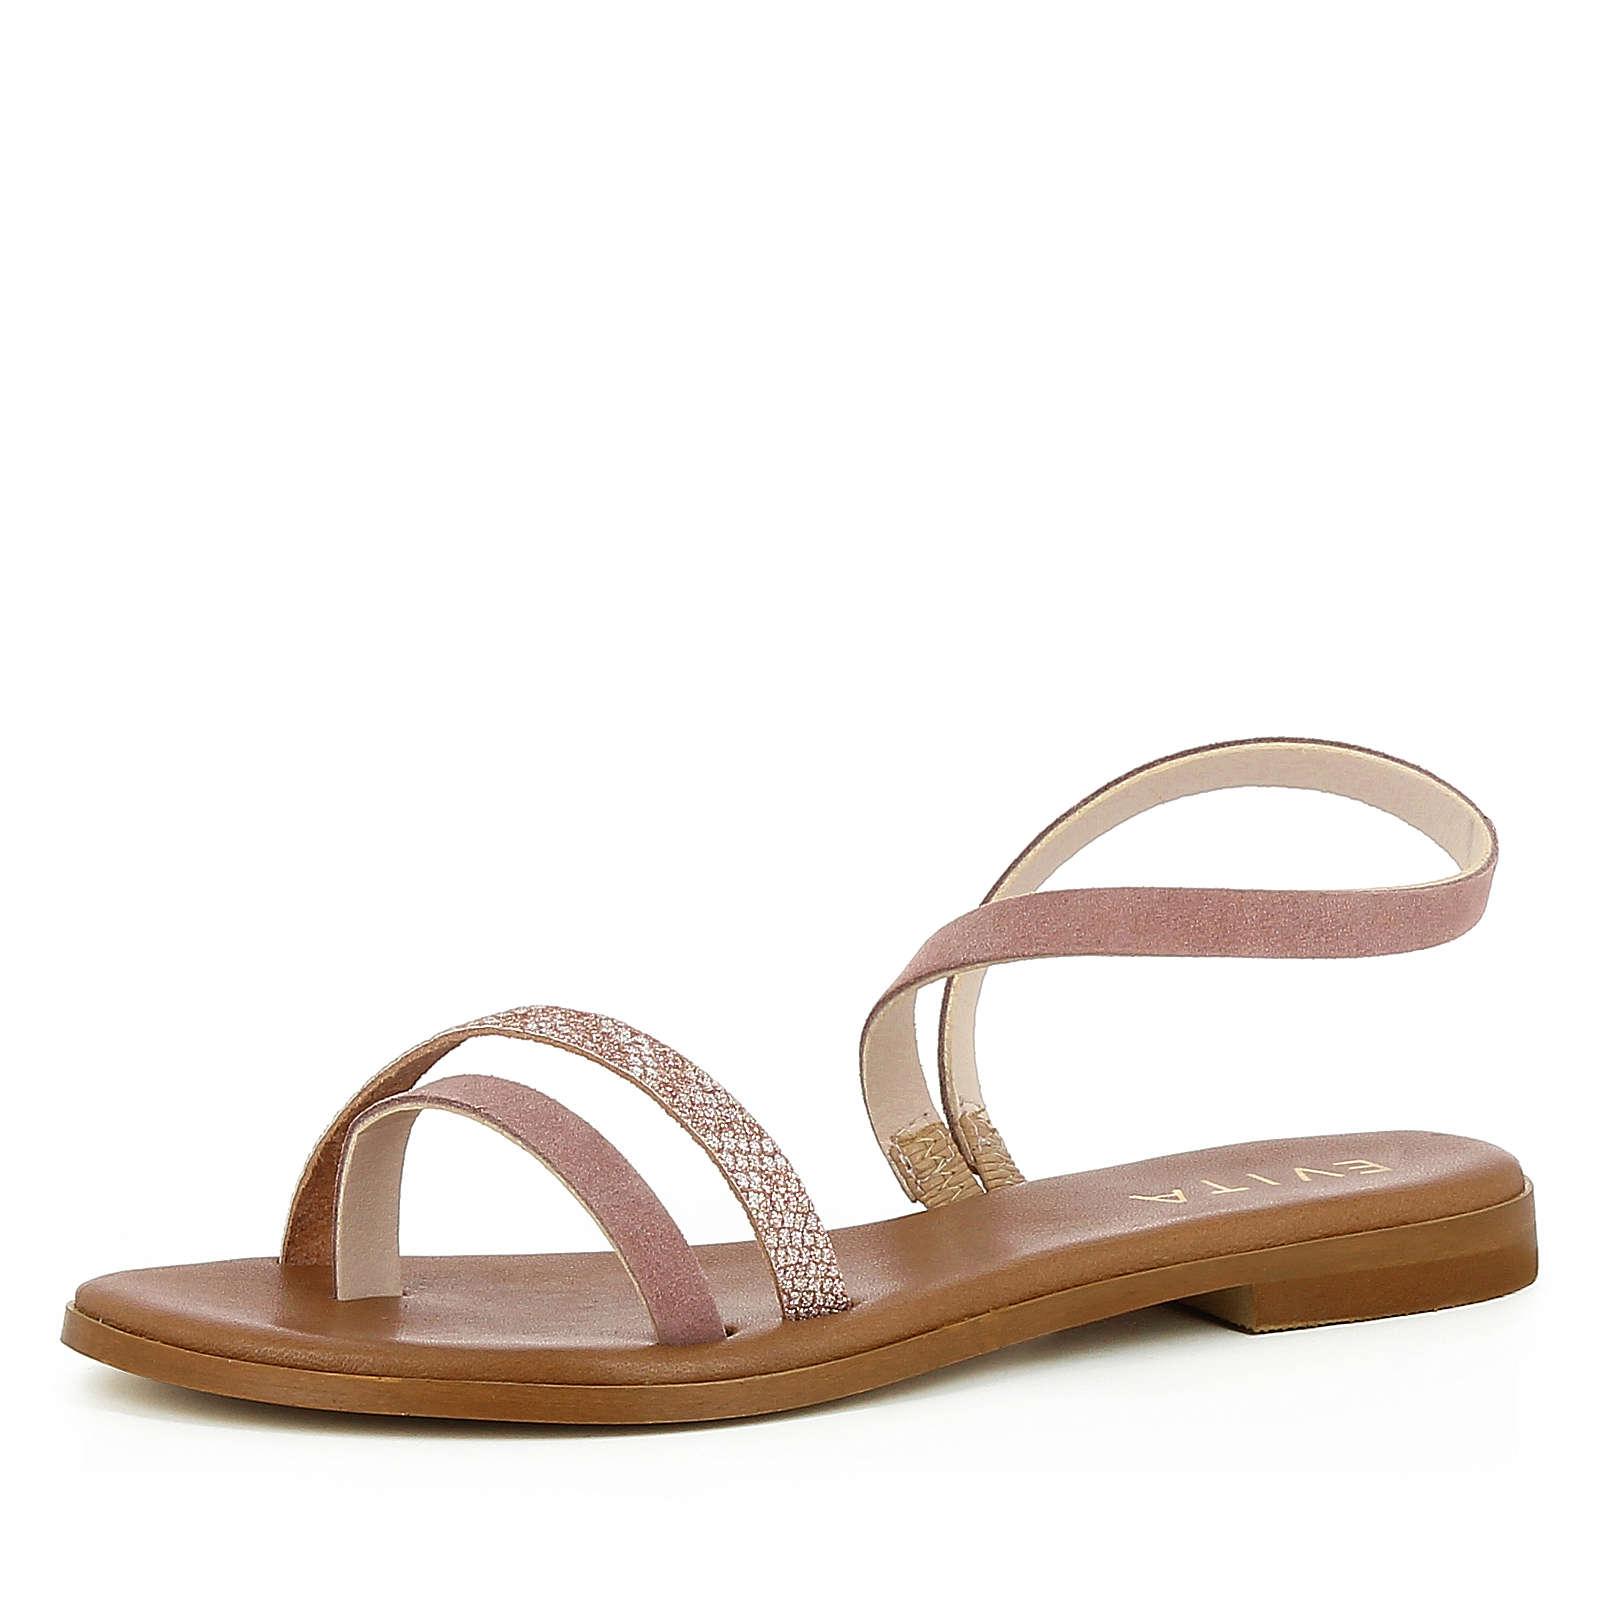 Evita Shoes Damen Sandale OLIMPIA Klassische Sandalen altrosa Damen Gr. 36